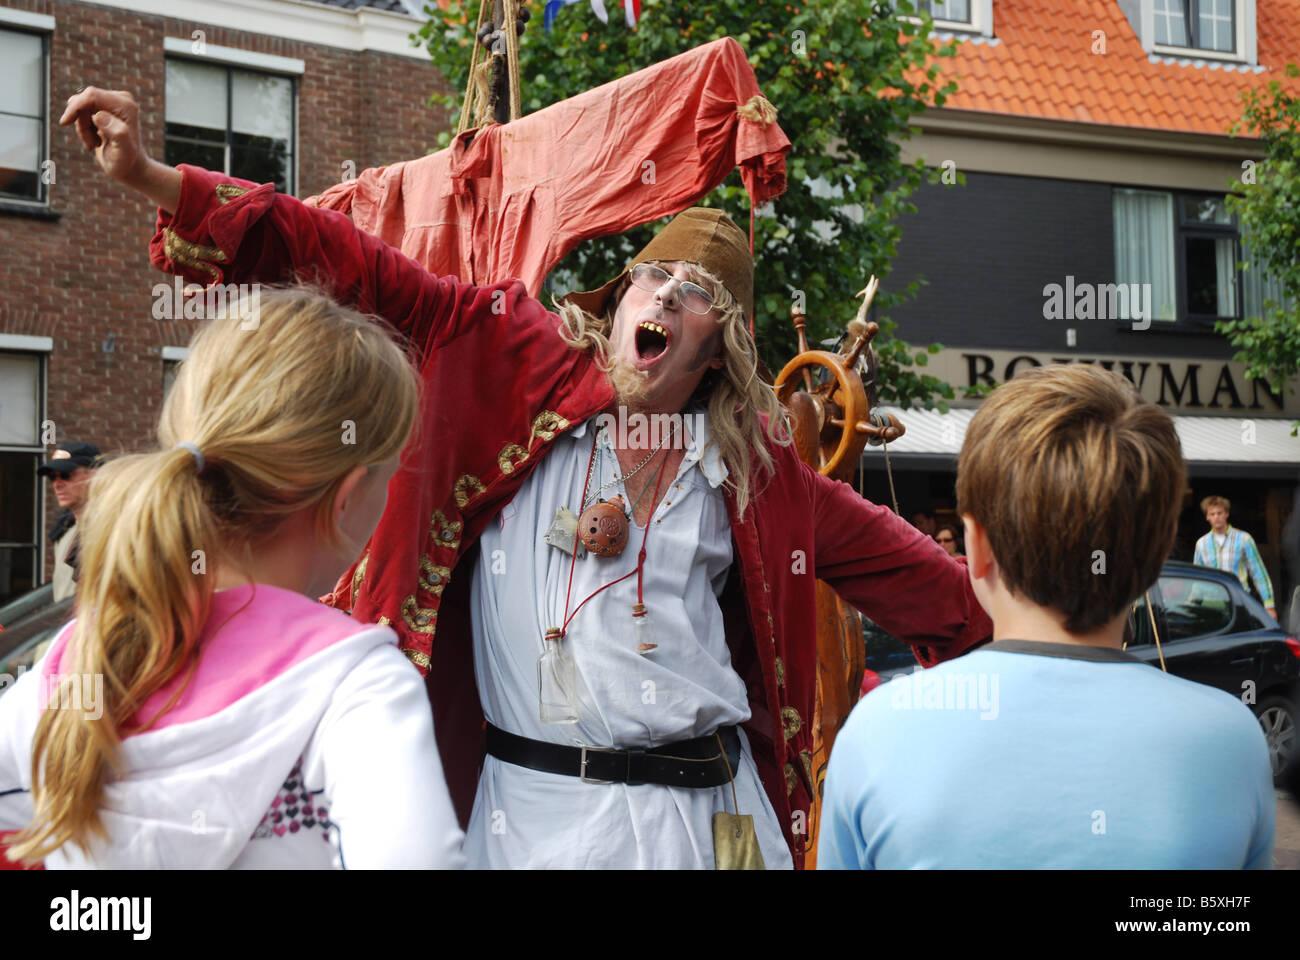 street artist performing his routine Domburg Zeeland Netherlands - Stock Image